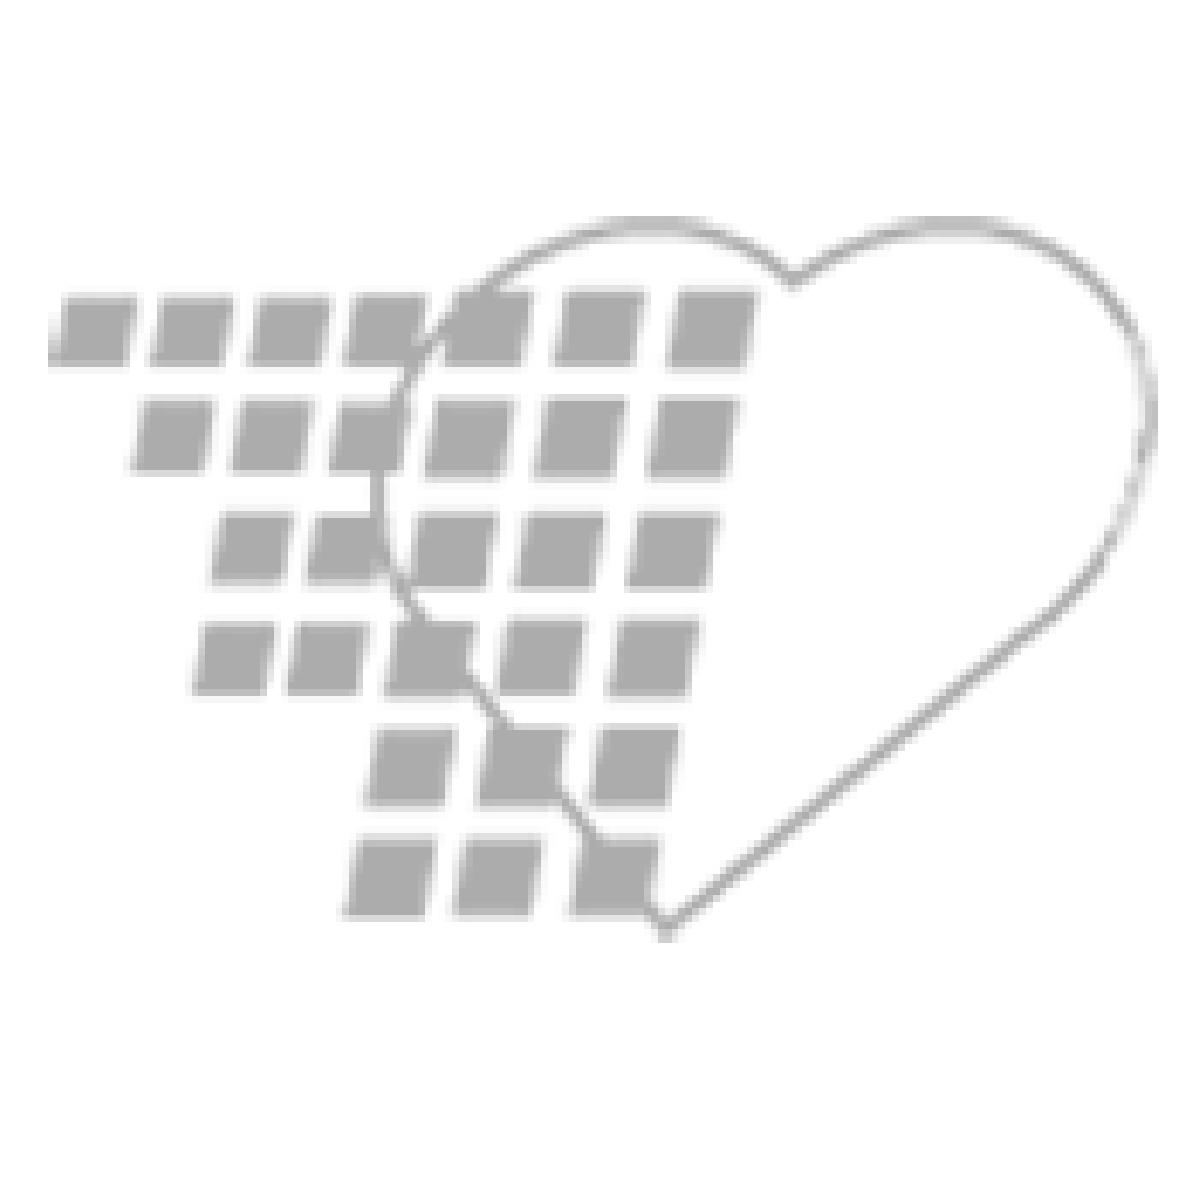 06-82-5130 Assure ID Safety Pen Needles